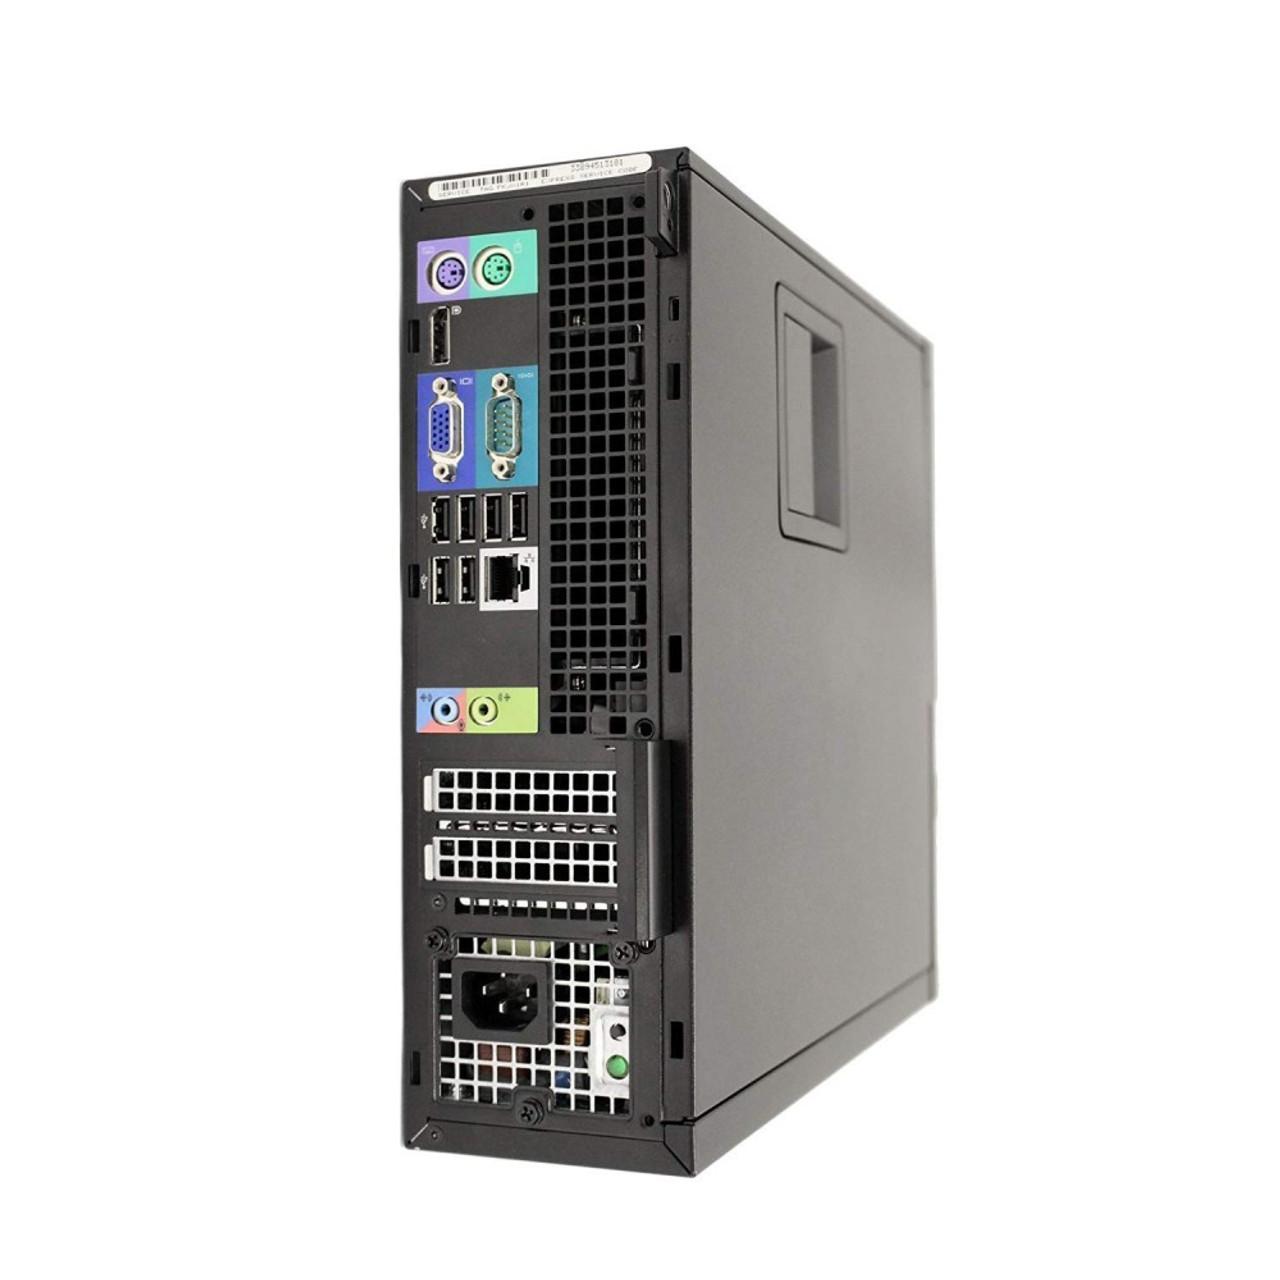 Dell Optiplex 990 SFF Quad Core i7 3.4GHz, 8GB Ram, 500GB HDD, DVD-RW, Windows 10 Pro 64 Desktop Computer